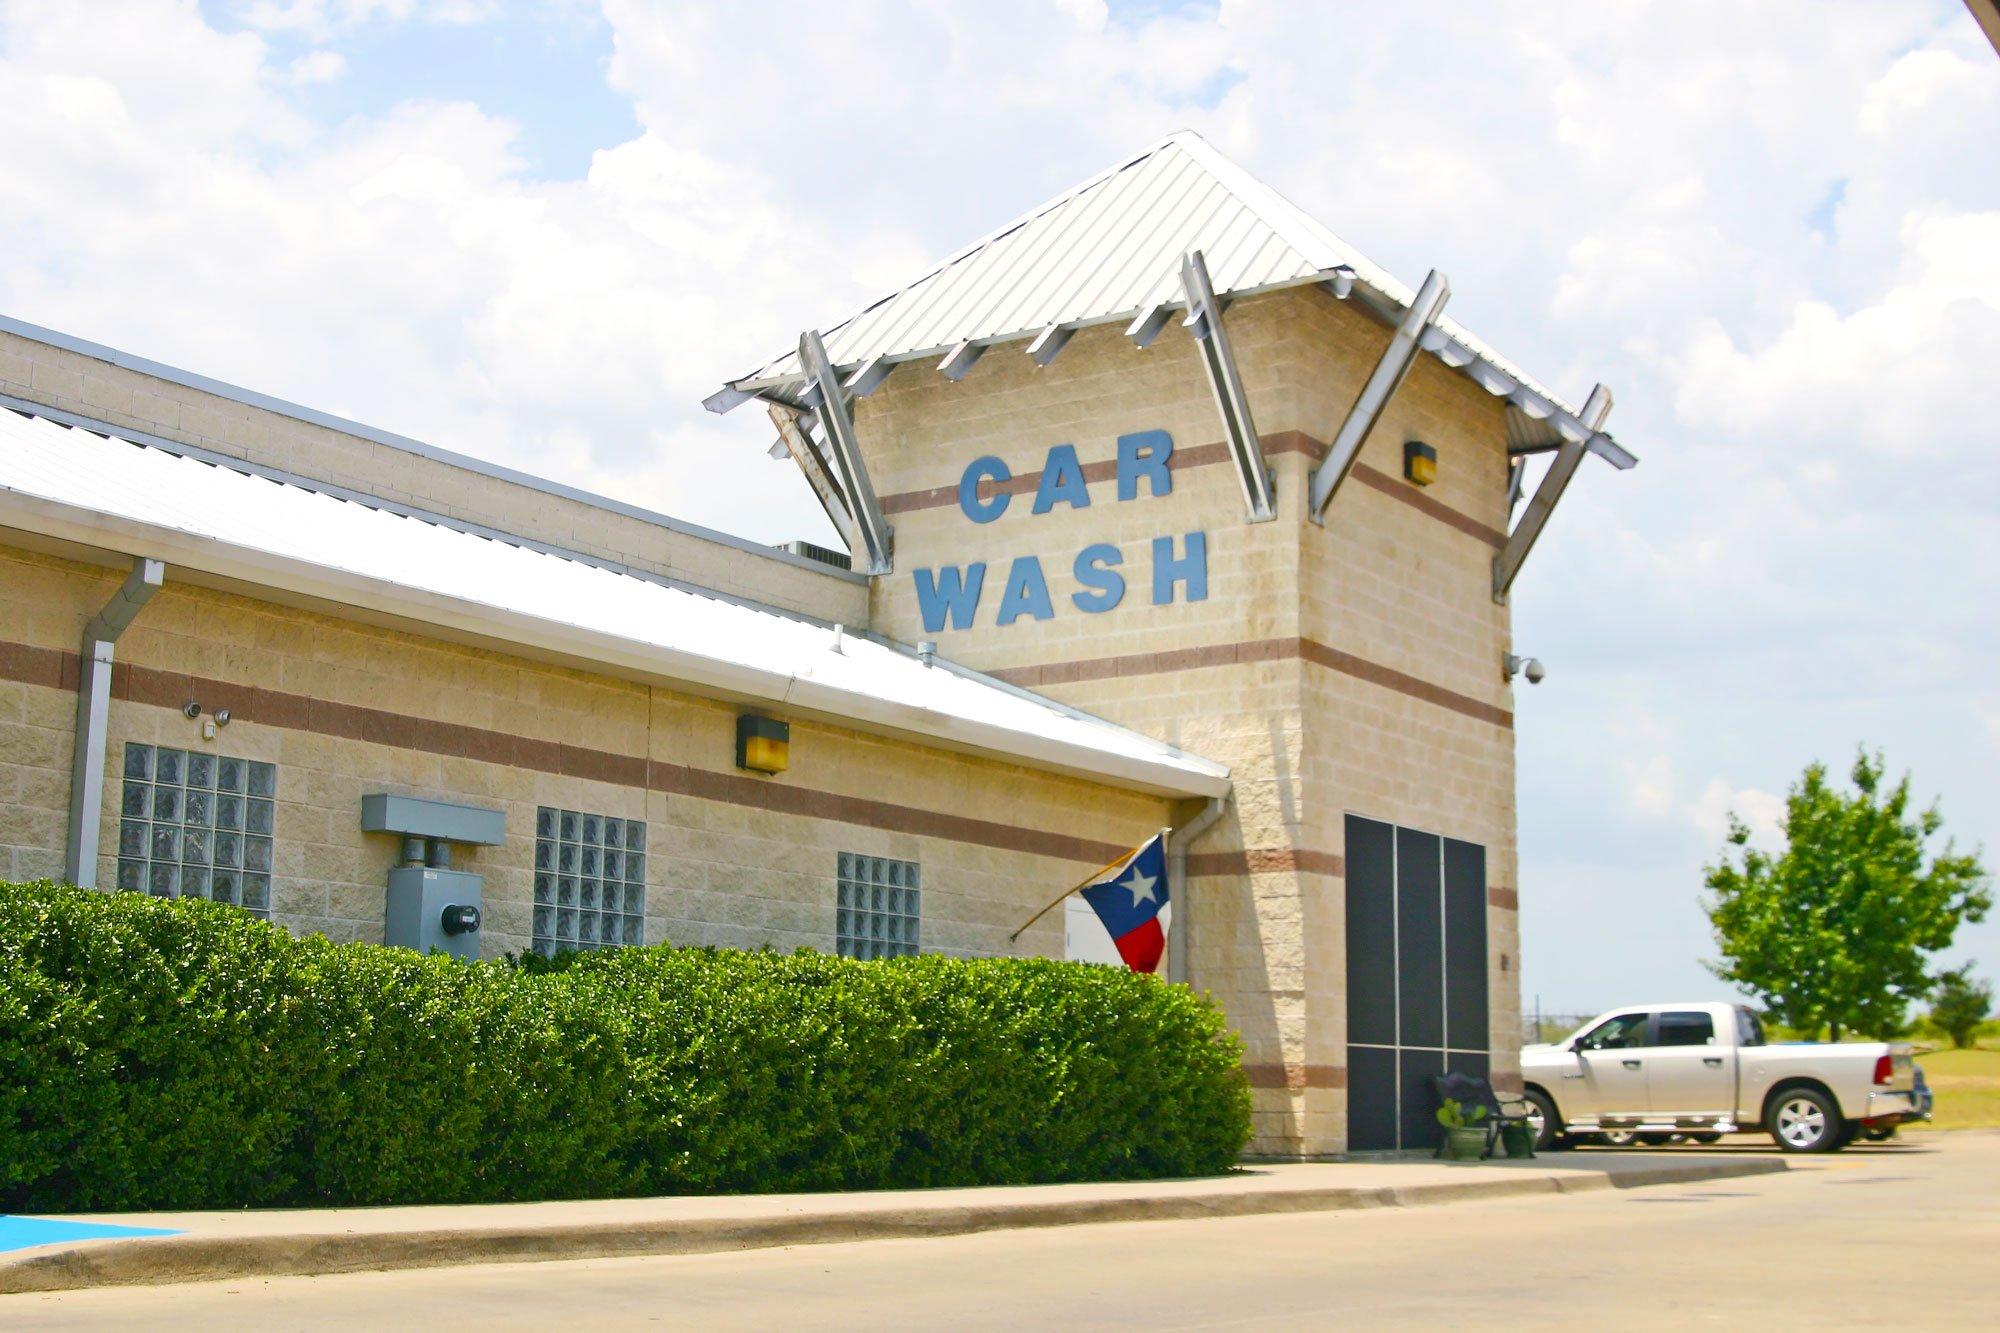 burleson,car wash,crowley,joshua,texas,oil change,pennzoil